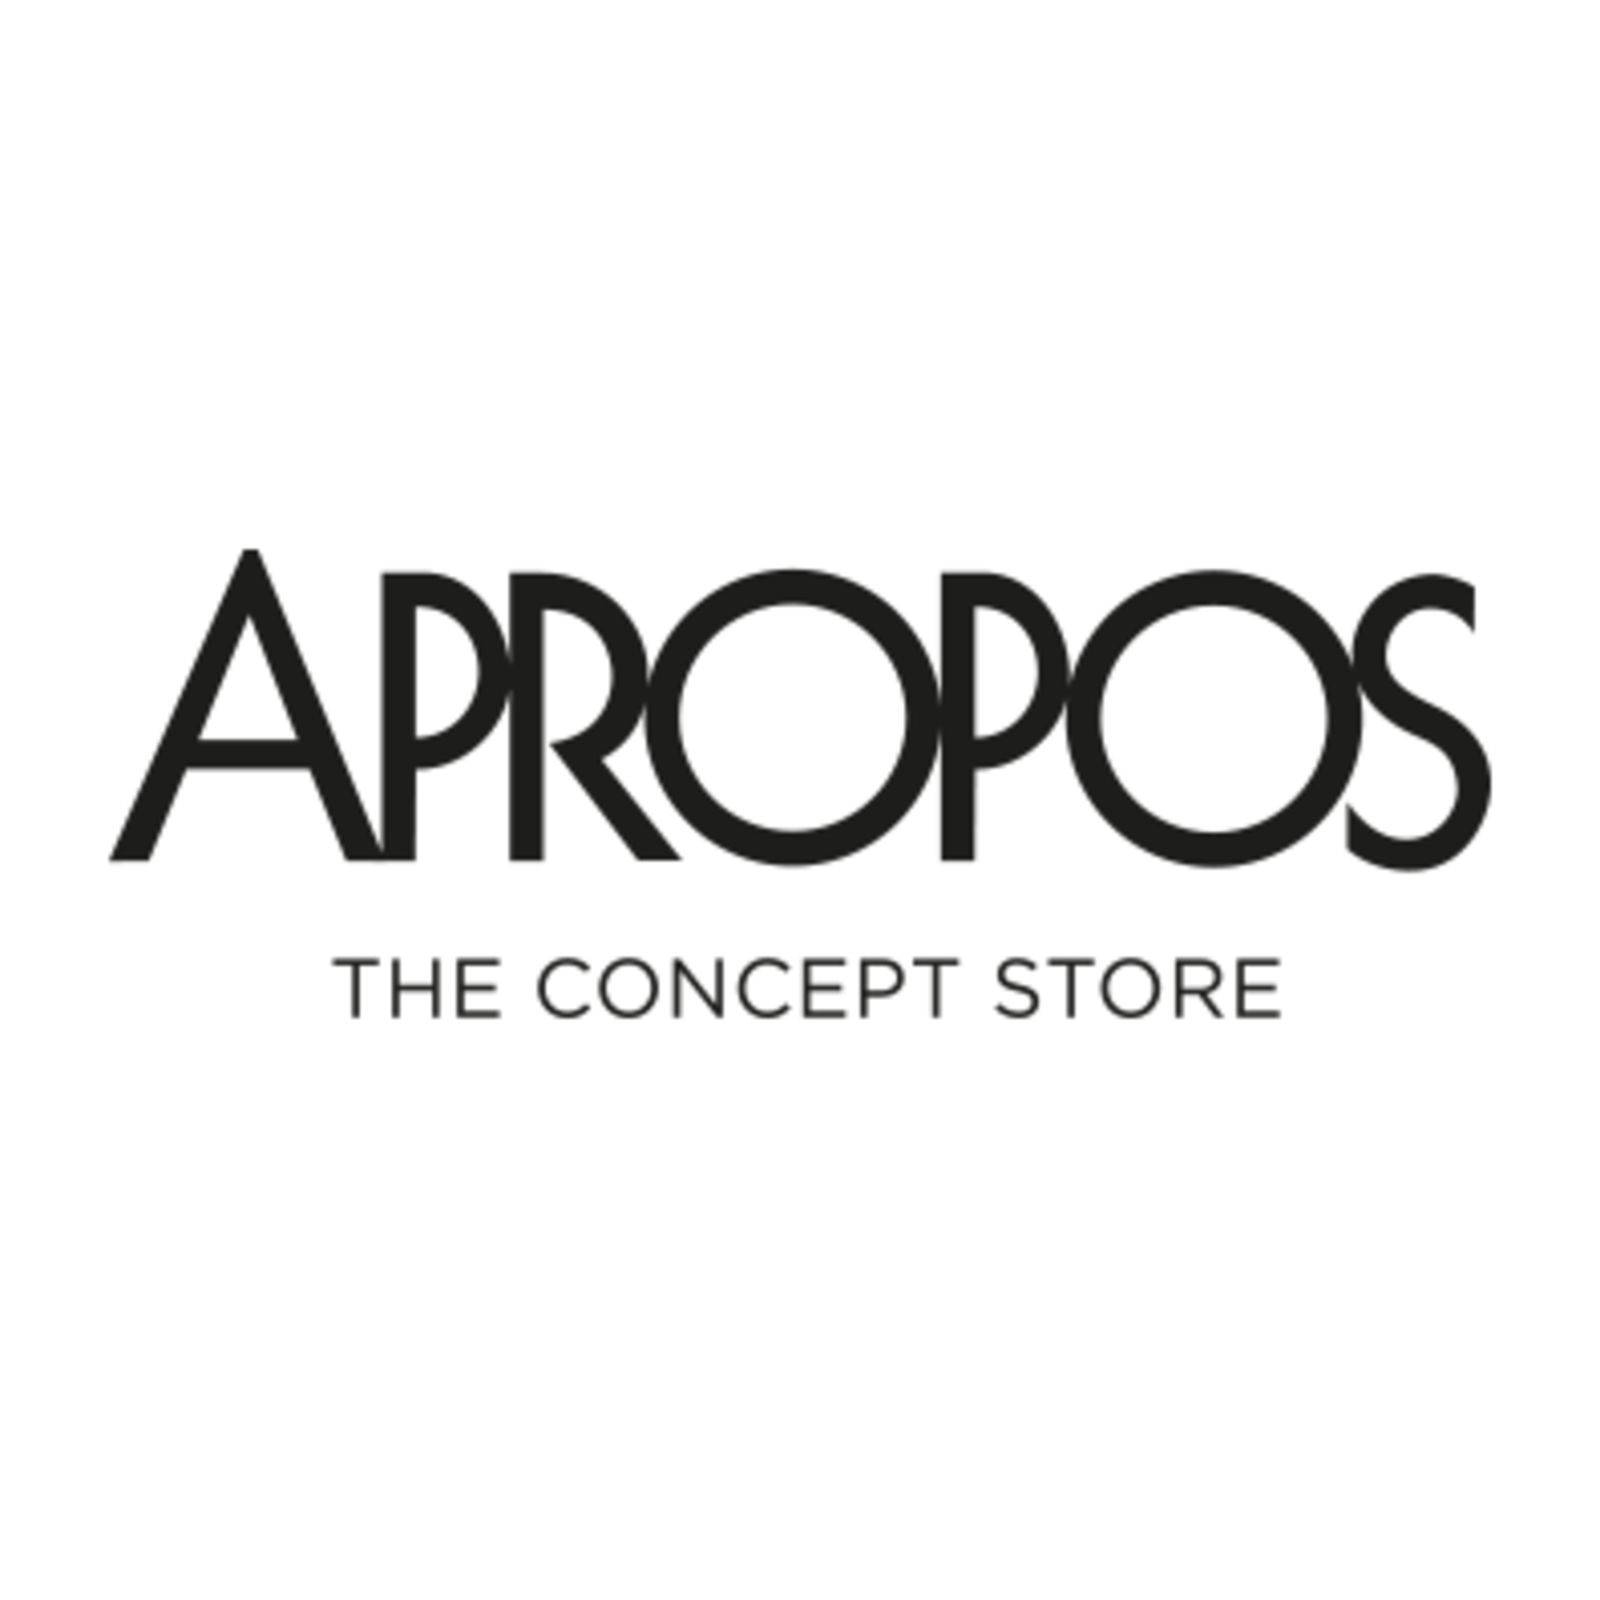 APROPOS The Concept Store in München (Bild 1)